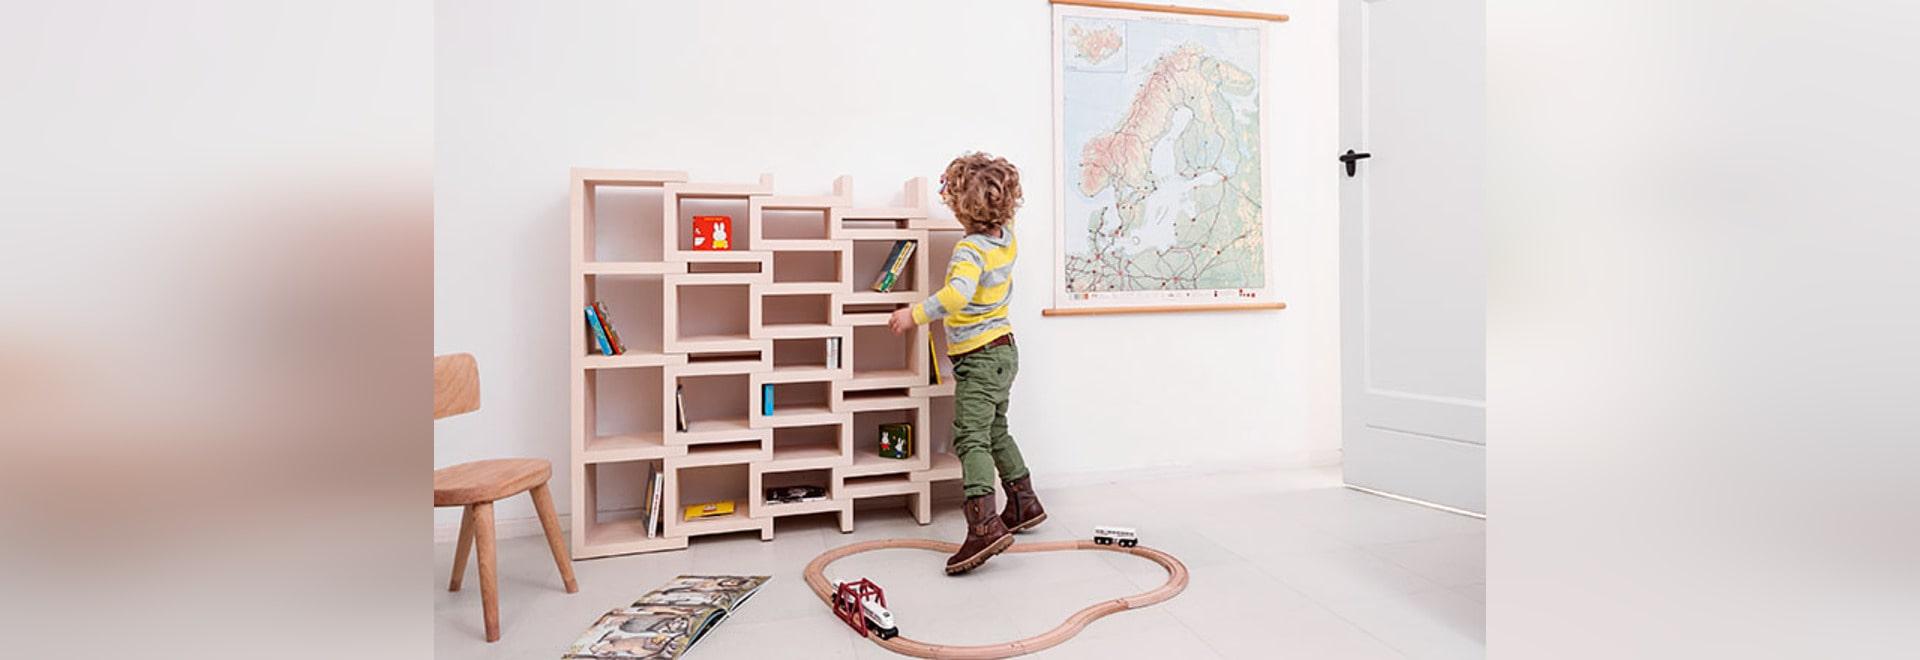 rek bookcase junior by reinier de jong   hd rotterdam  - rek bookcase junior by reinier de jong